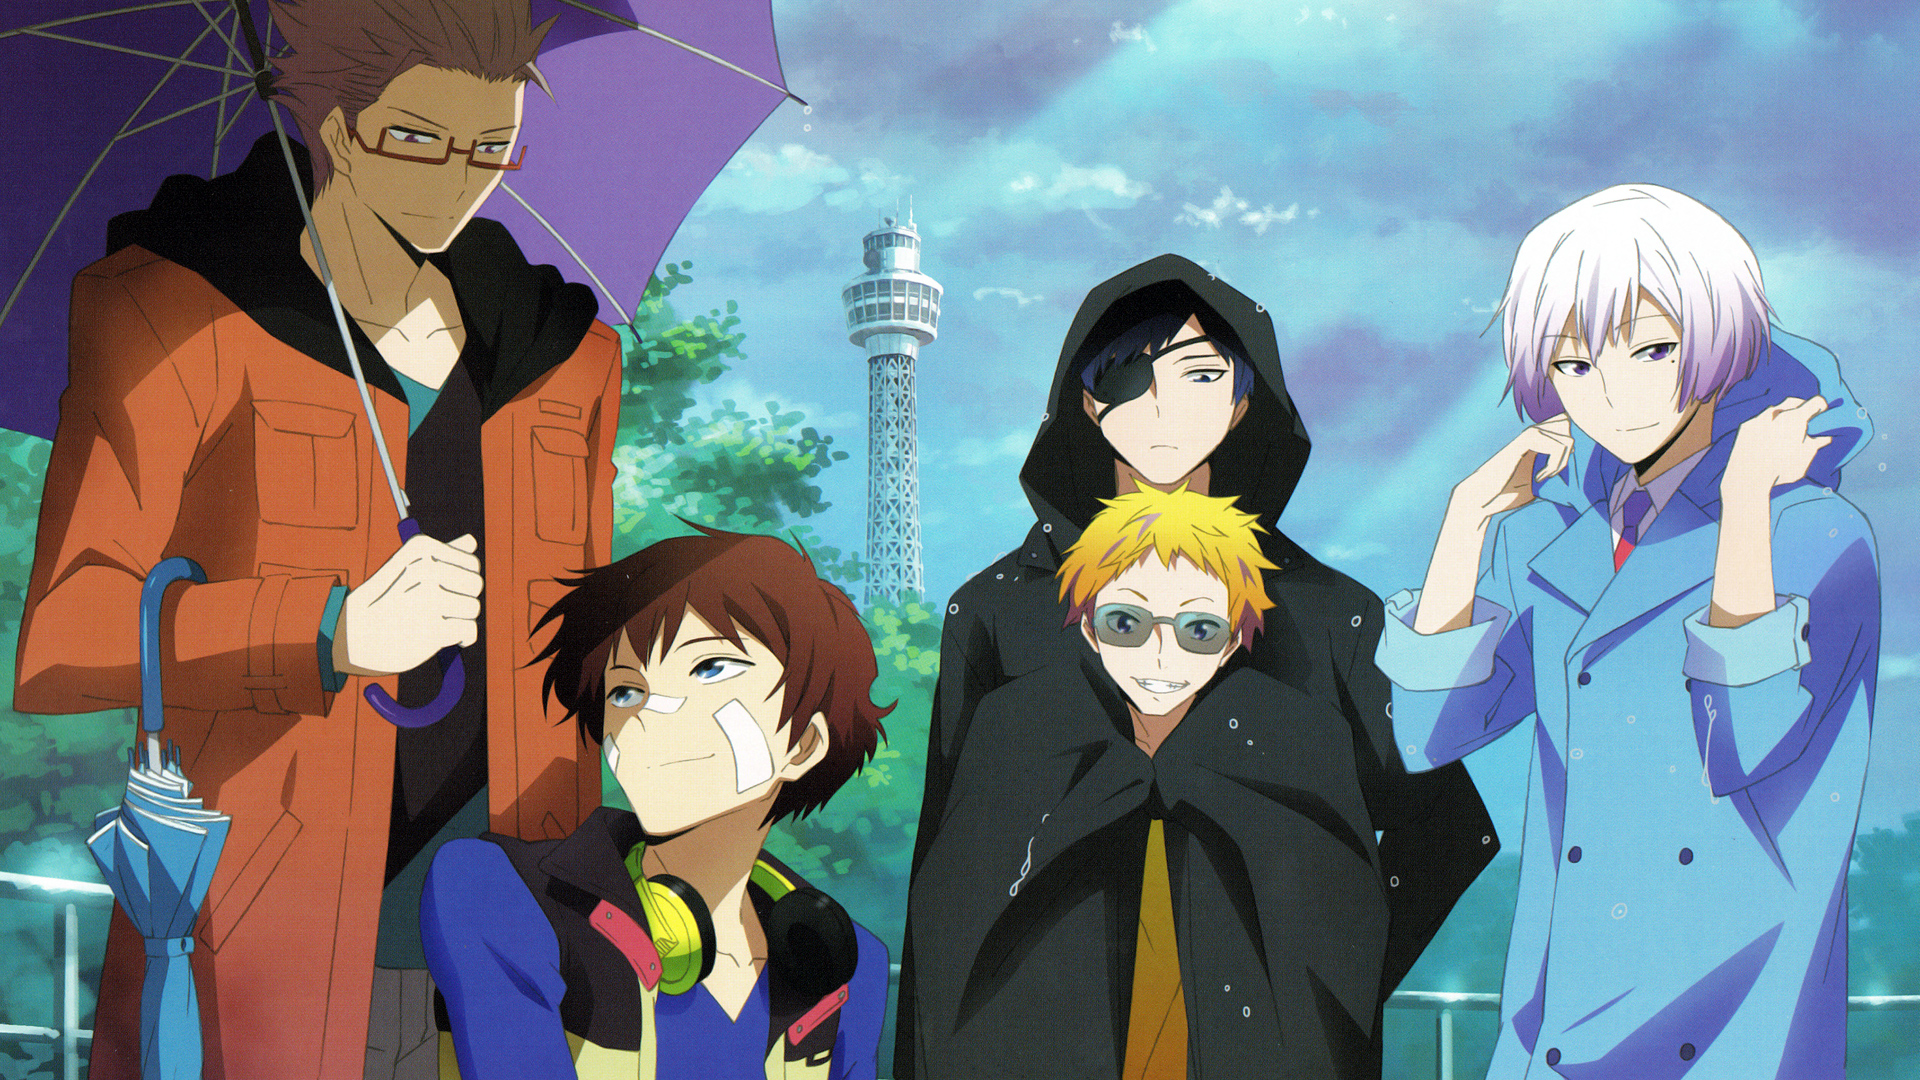 Anime Character Birthday 7 July : Hamatora anime wallpaper hd